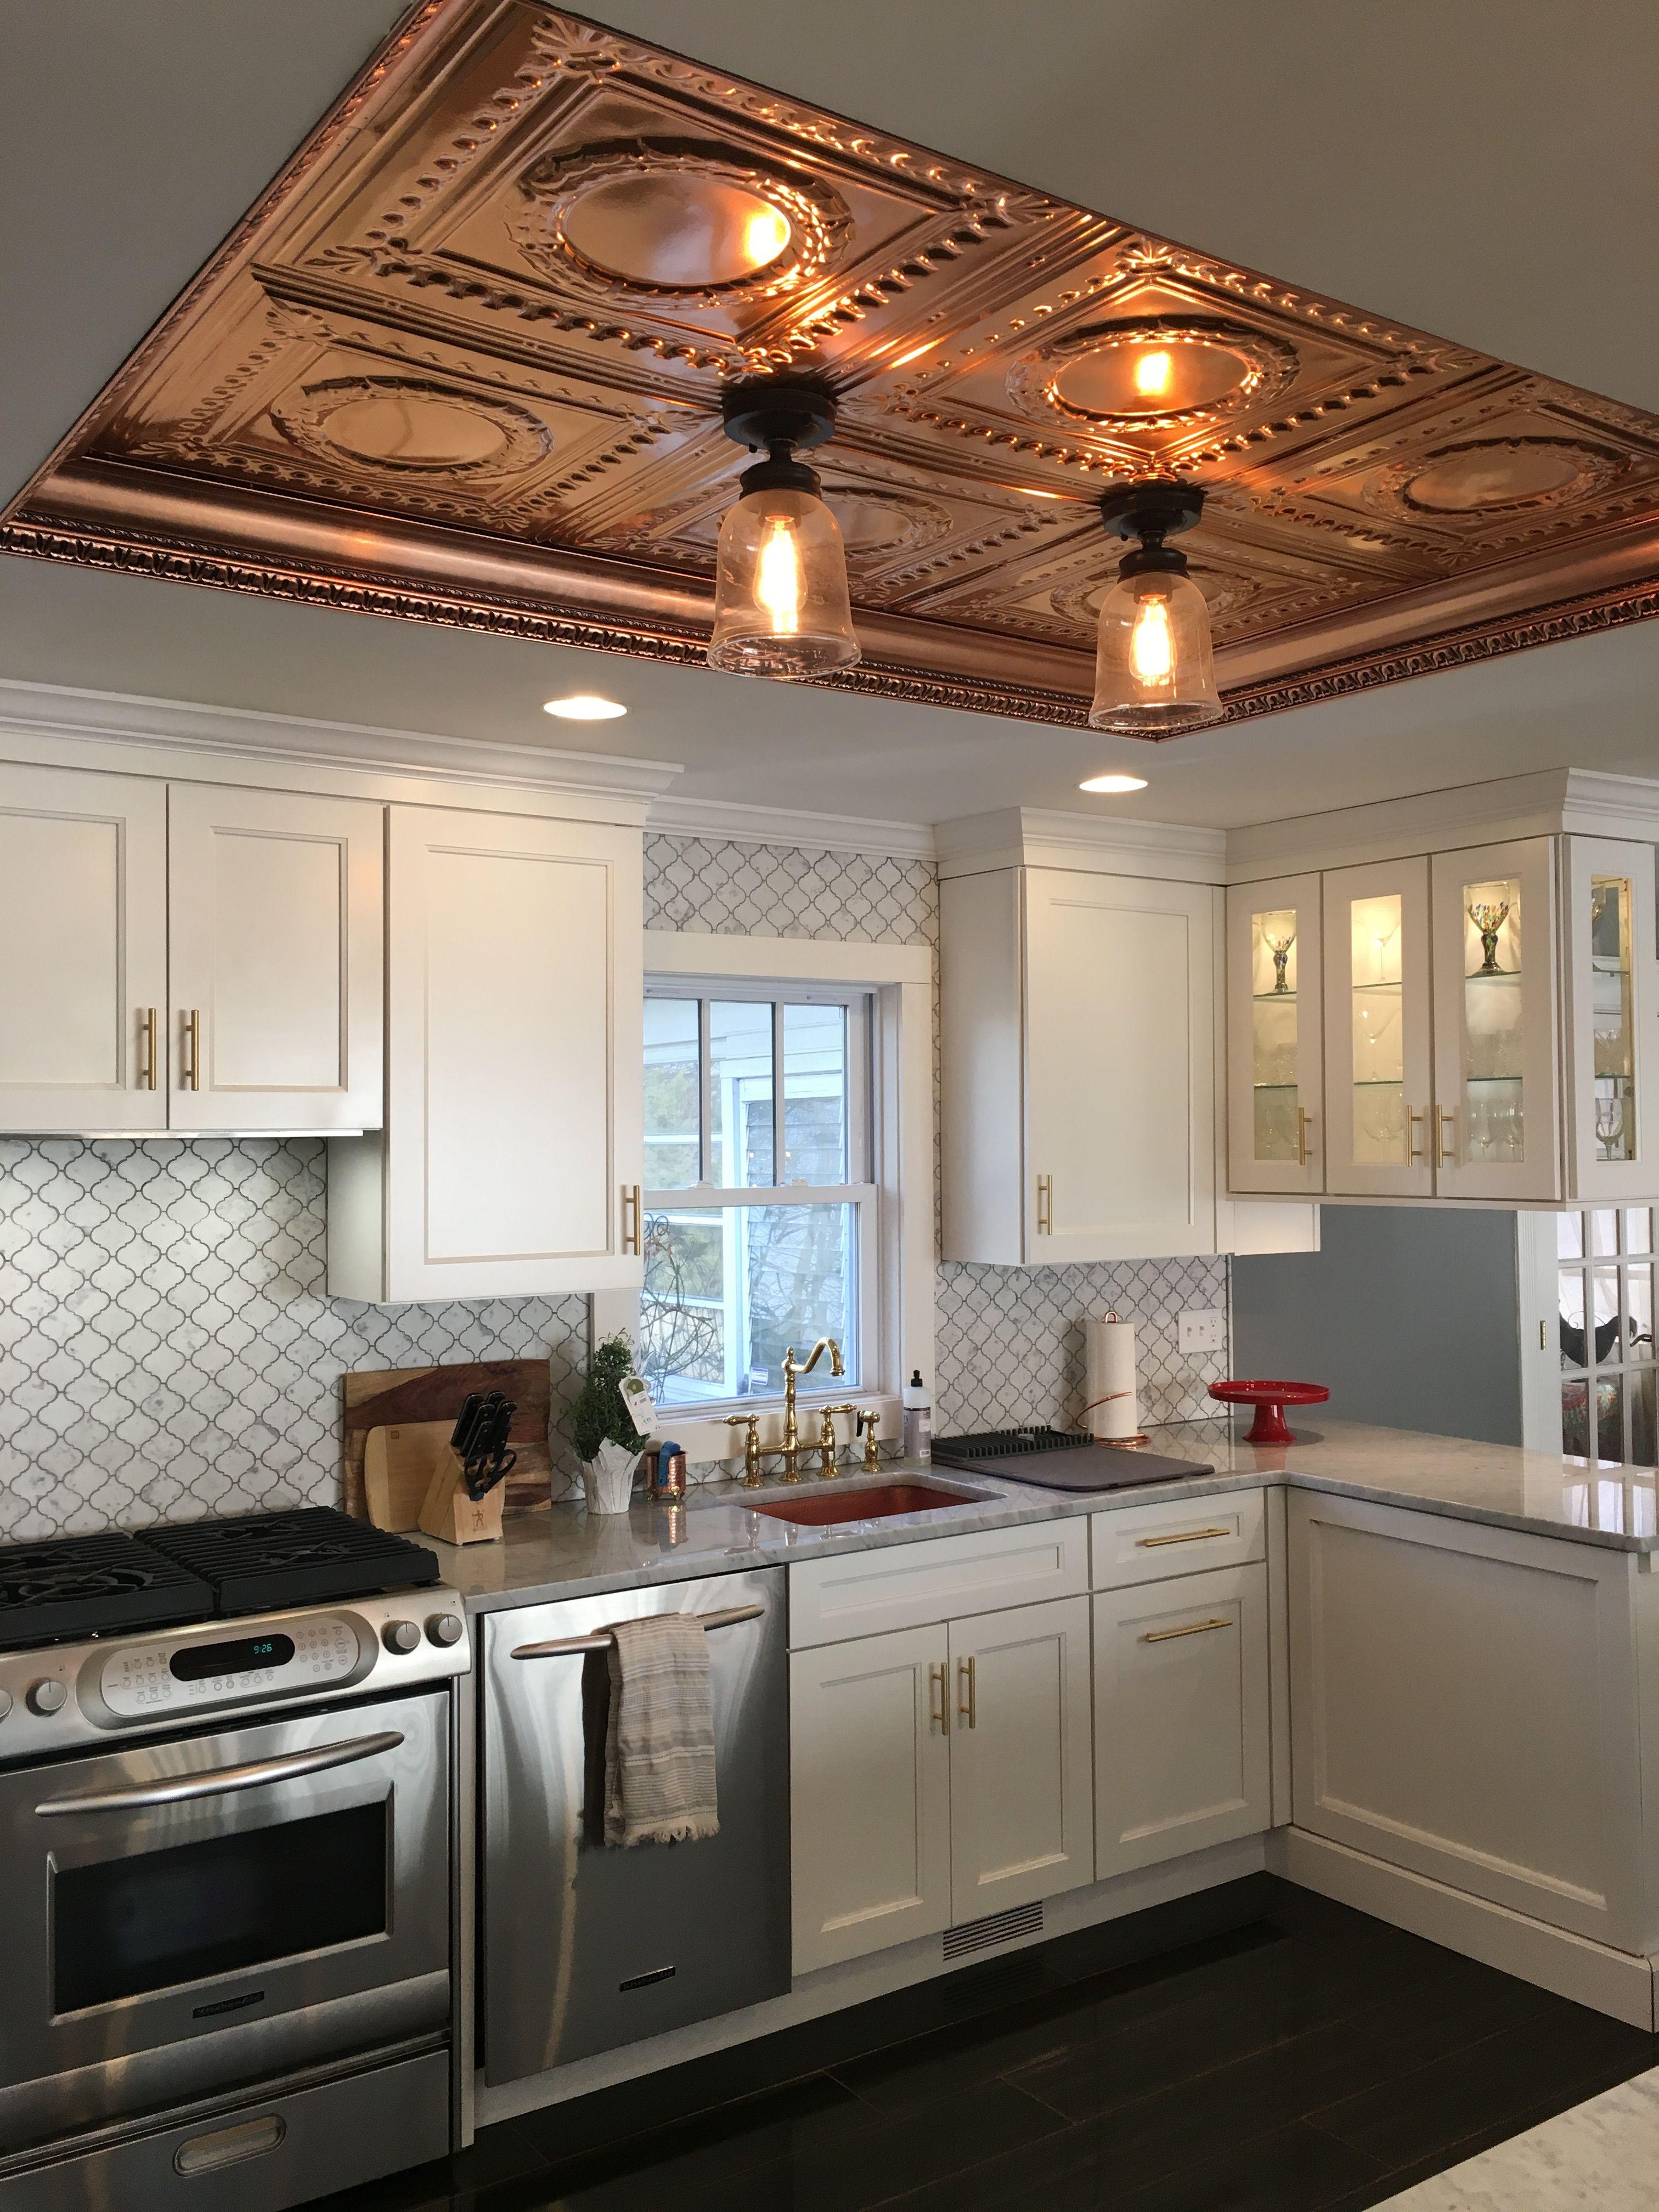 Copper ceiling. Copper sink. Schrock shaker